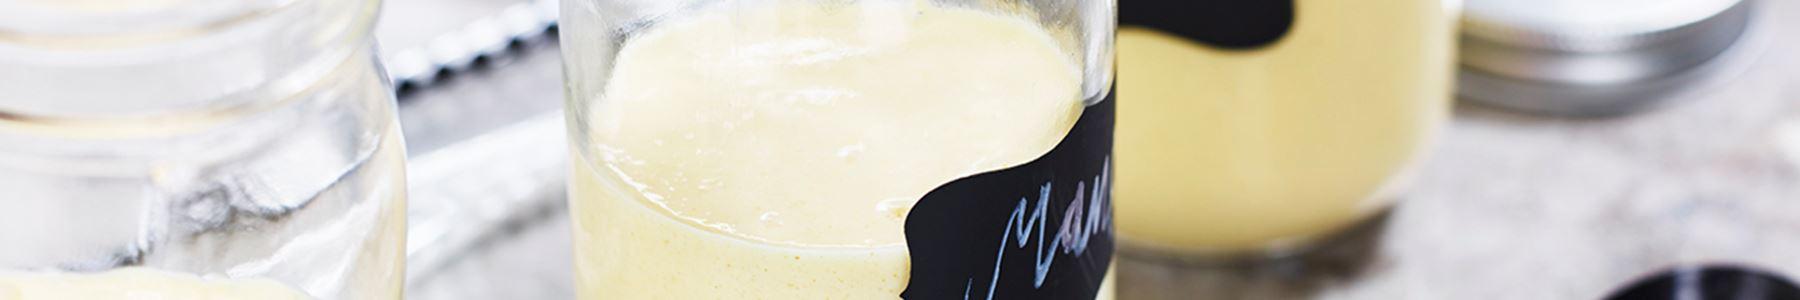 gurkmeja recept smoothie